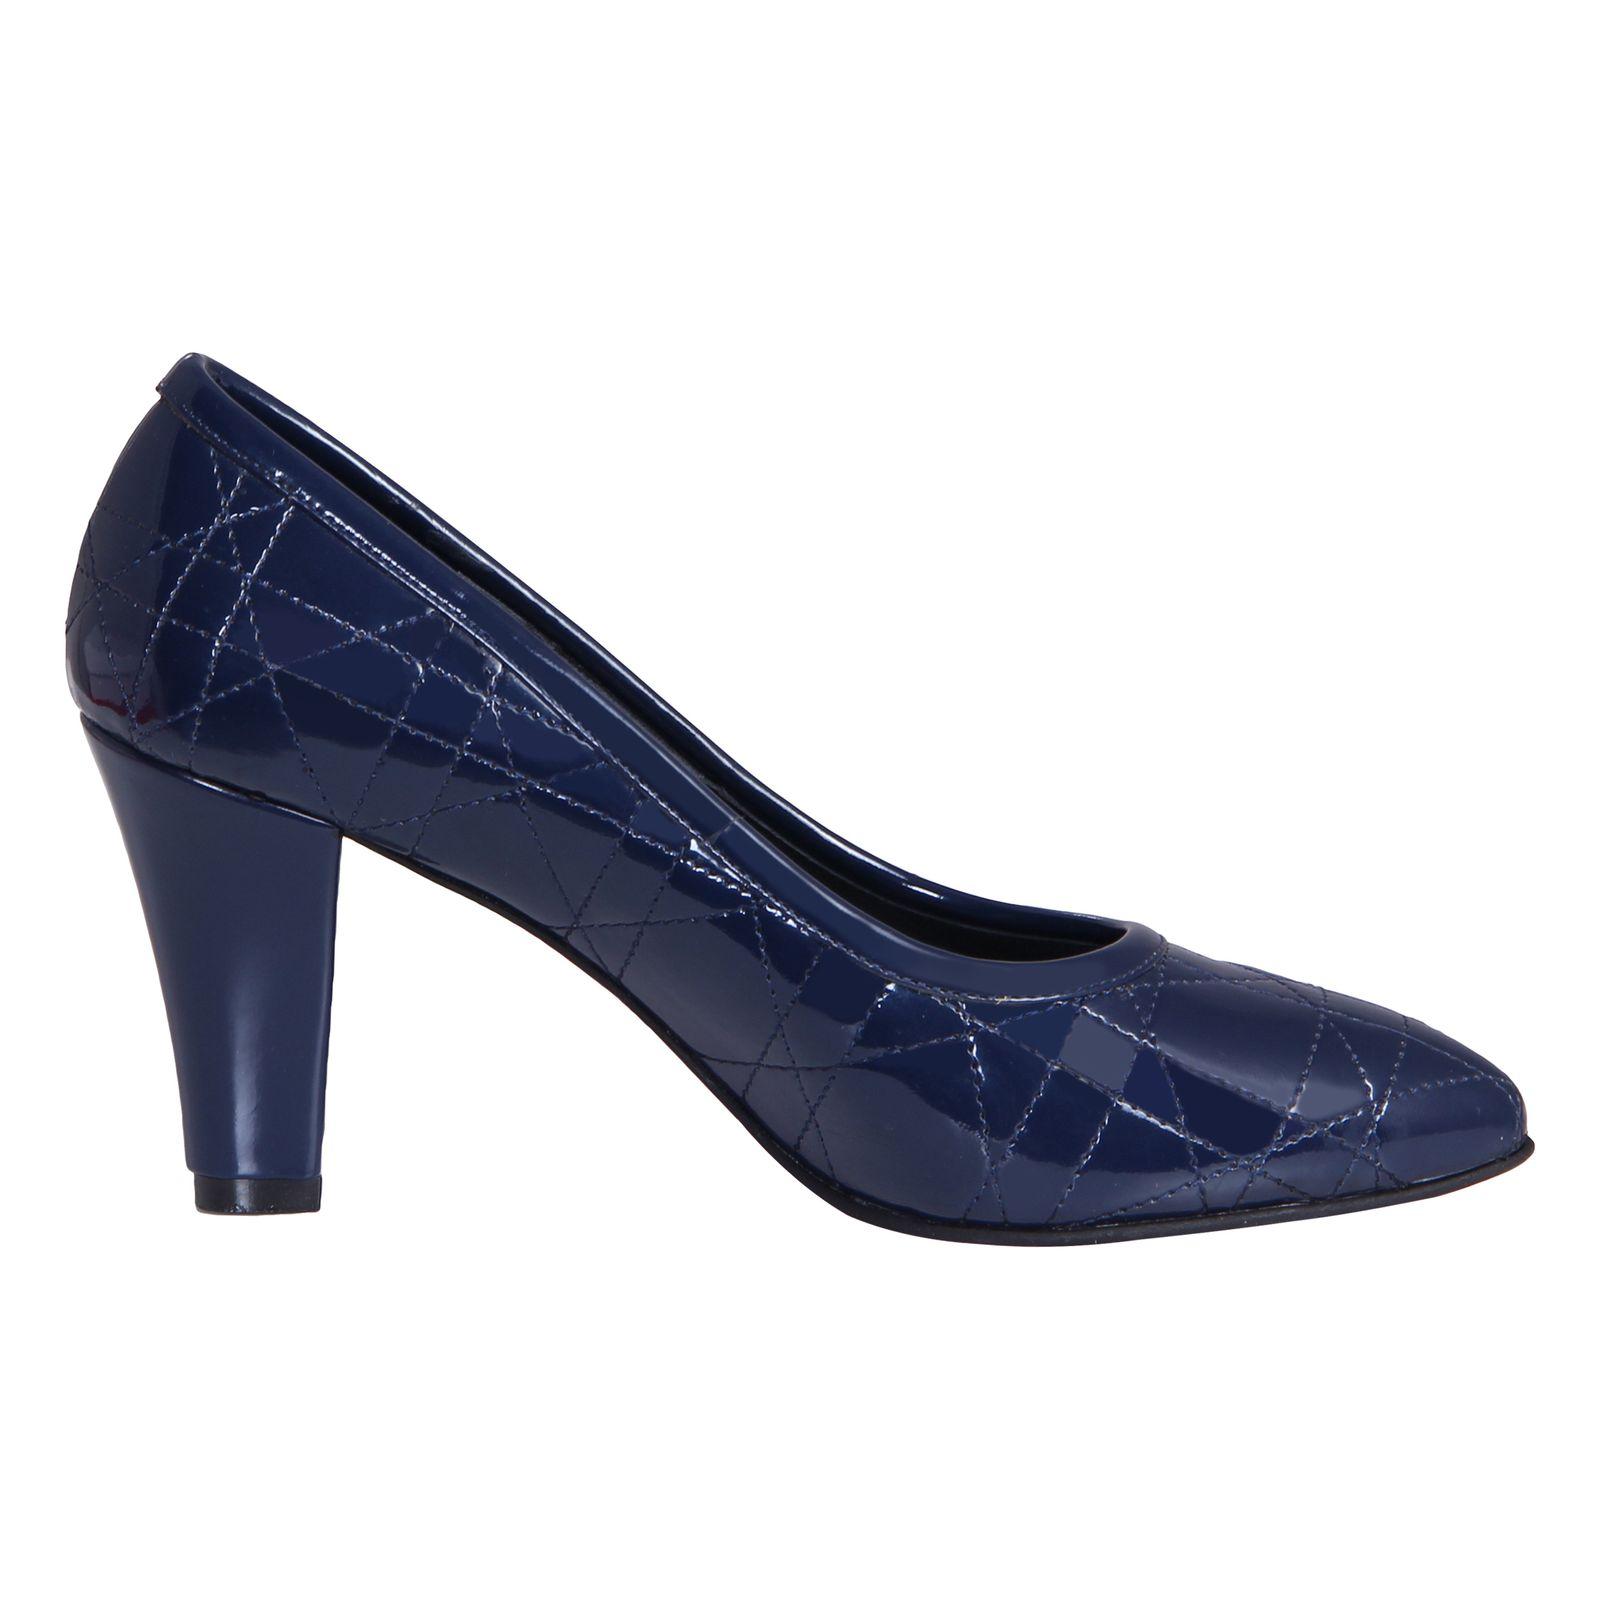 کفش زنانه شهر چرم کد 13-39963 -  - 2